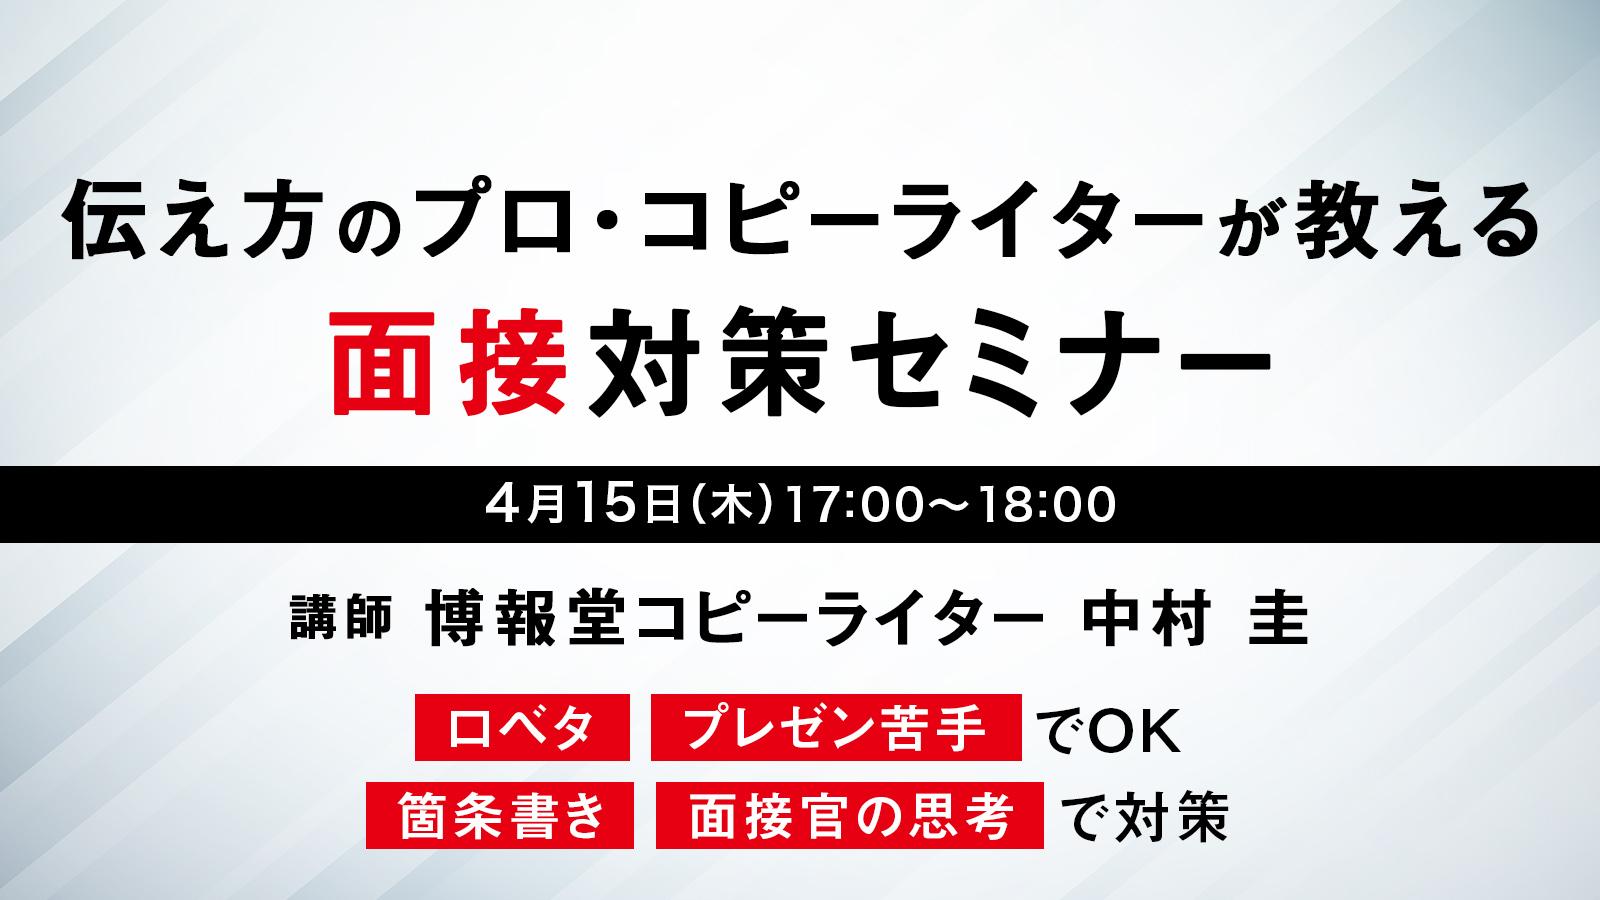 MSM167_tsutaekata_1600×900.jpg